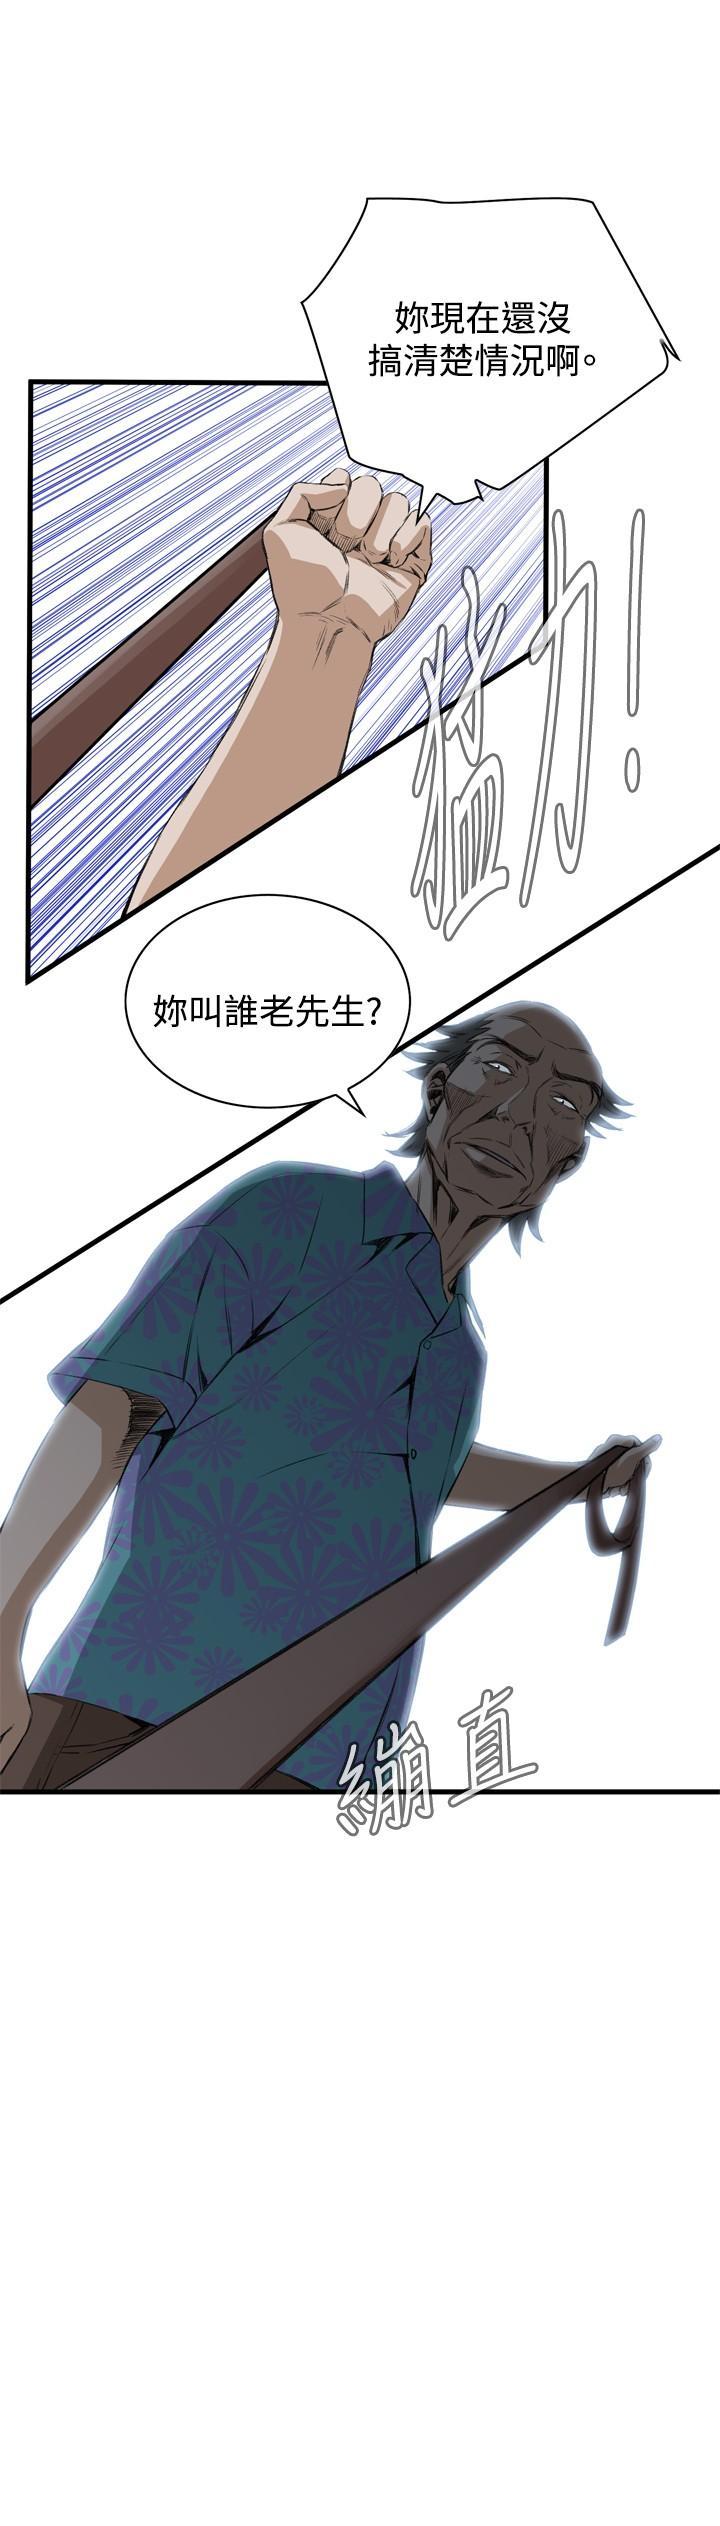 Take a Peek 偷窥 Ch.39~60 [Chinese]中文 269